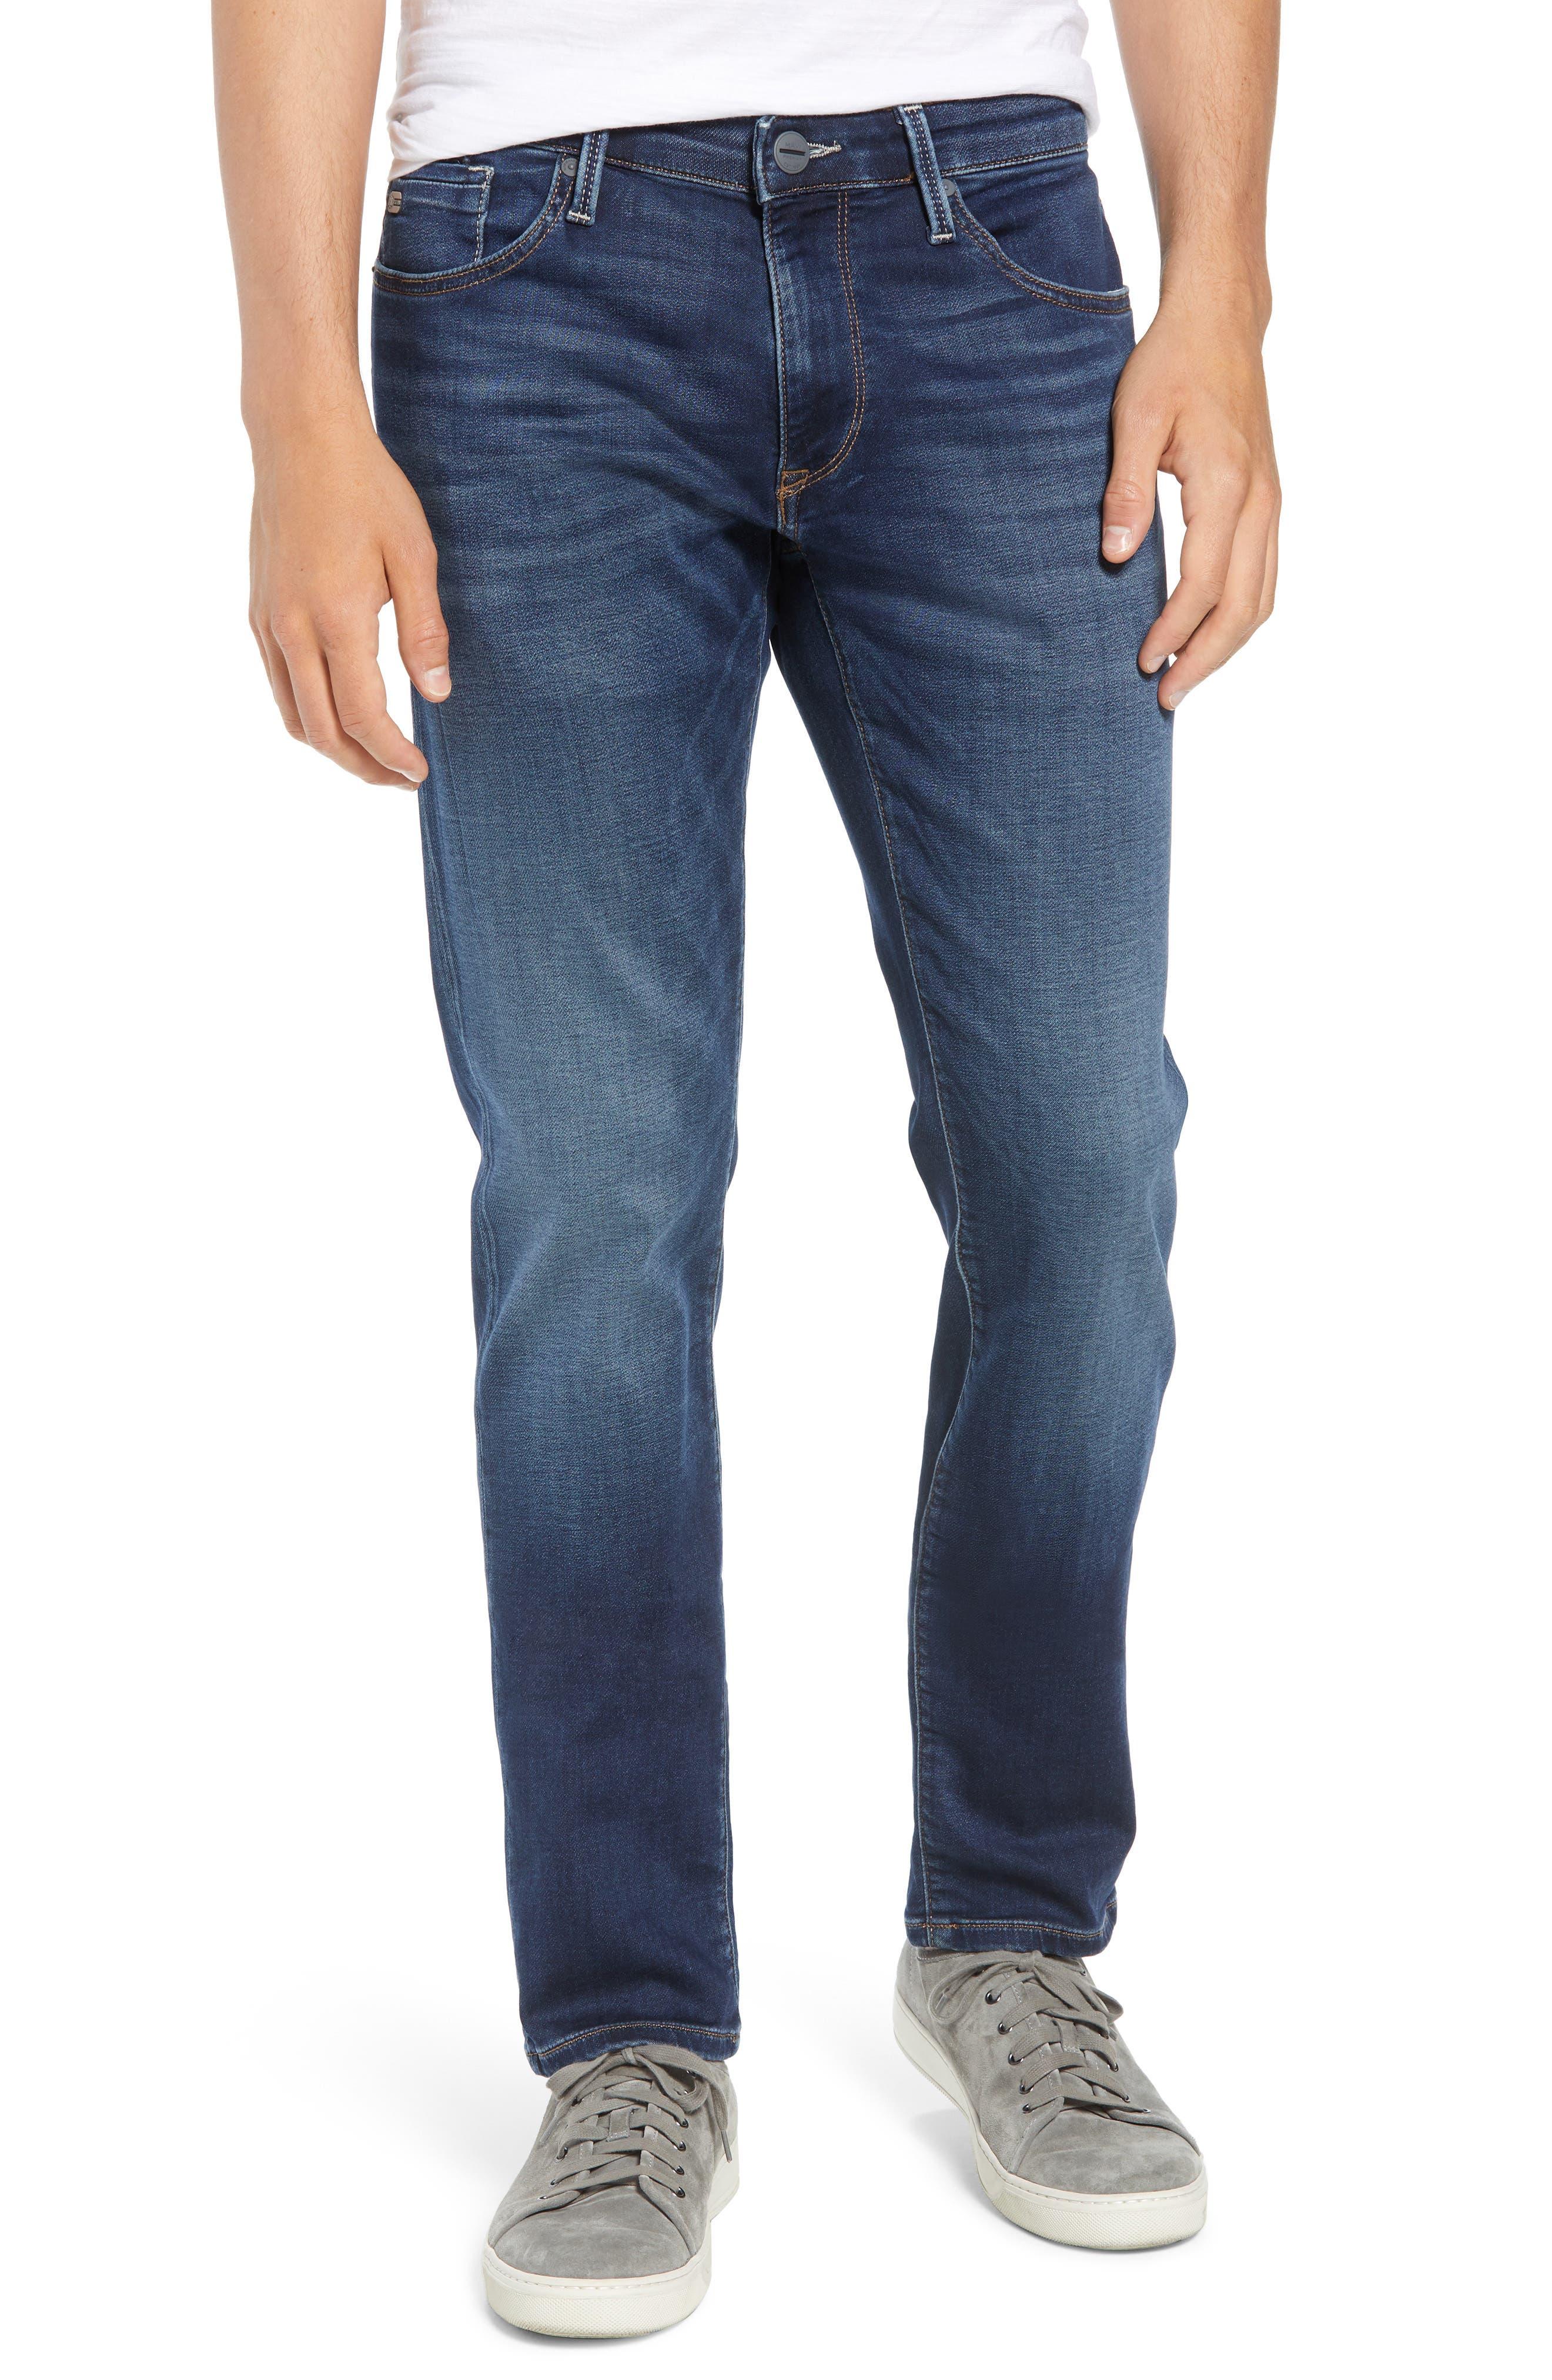 Jake Slim Fit Jeans,                         Main,                         color, DARK SPORTY